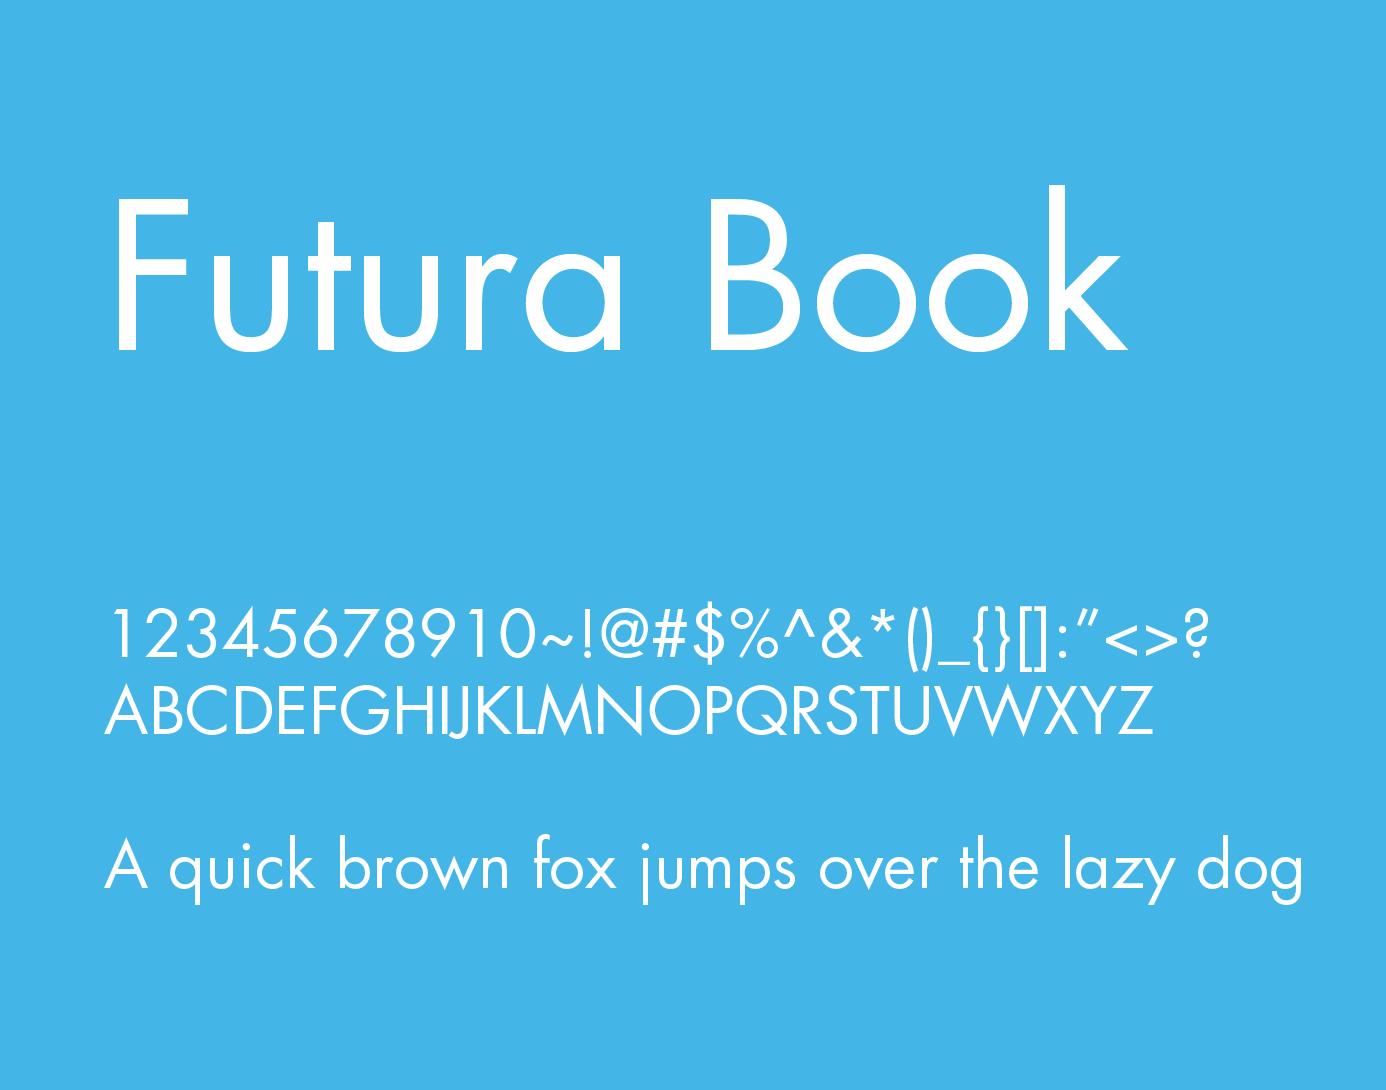 Futura Book Font Free Download   Fonts   Free fonts download, Italic